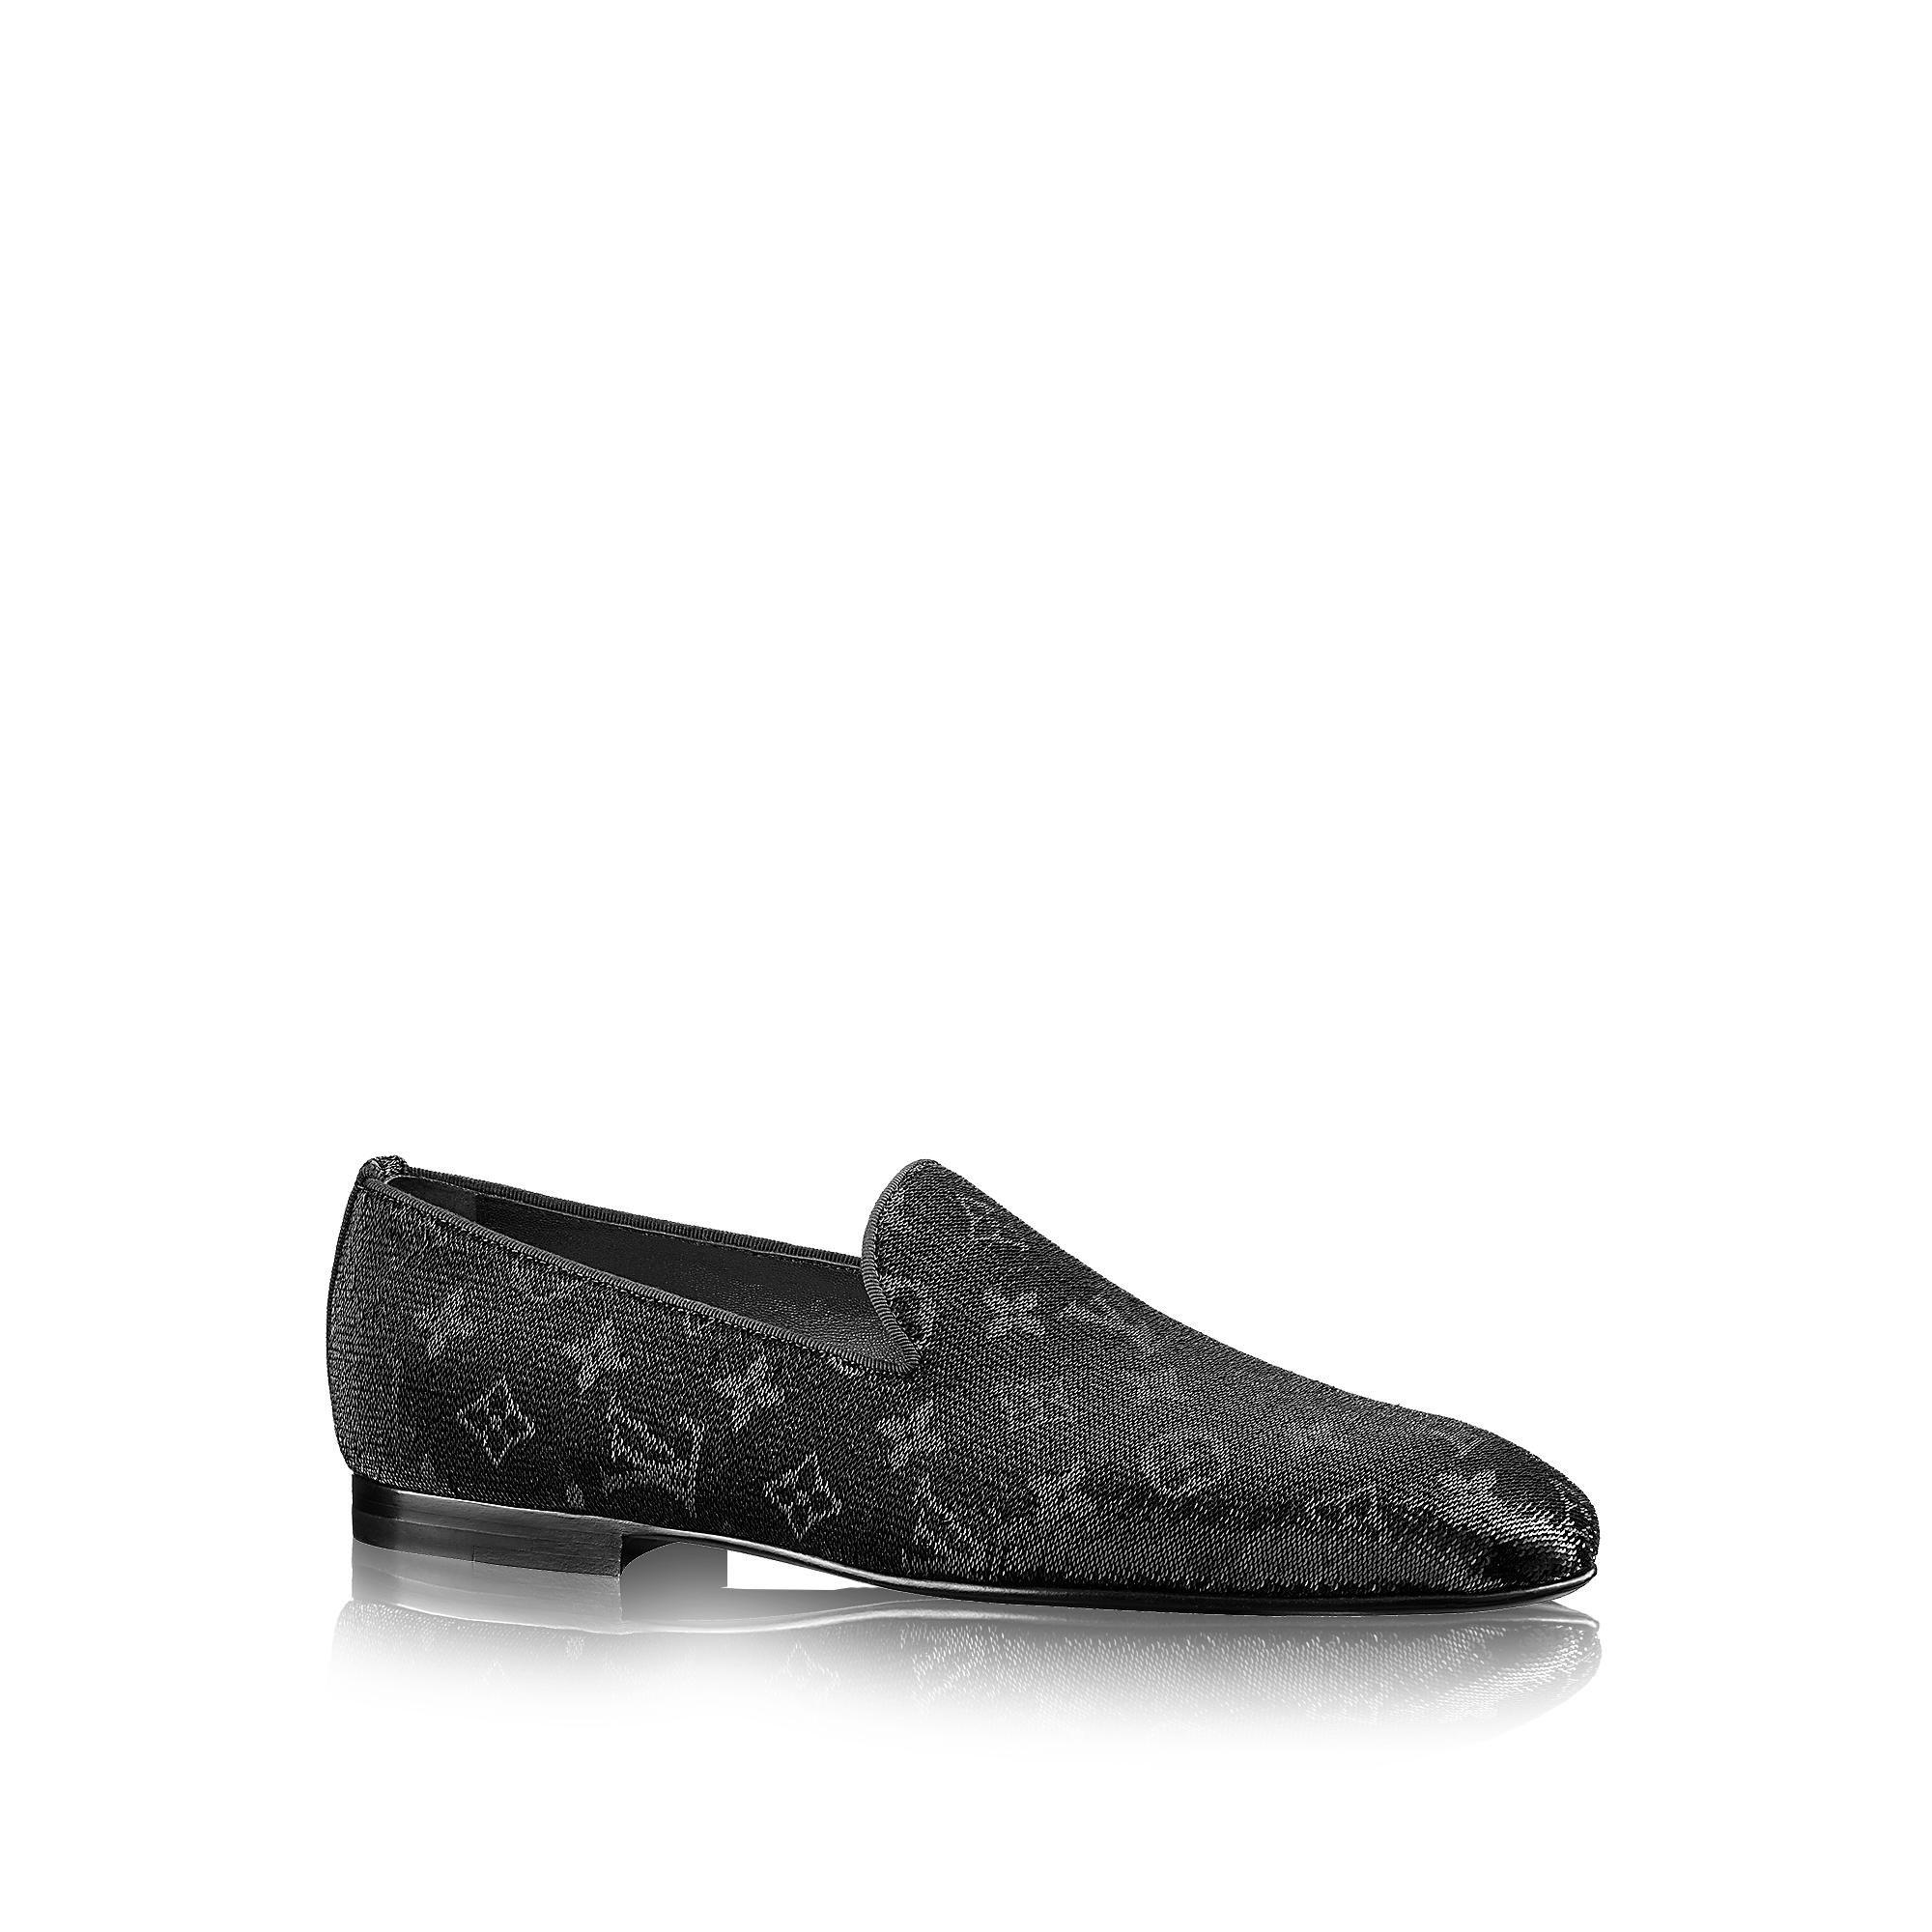 Gamer Mode Men Slip-On Loafers Fashion Lightweight Tennis Sneakers